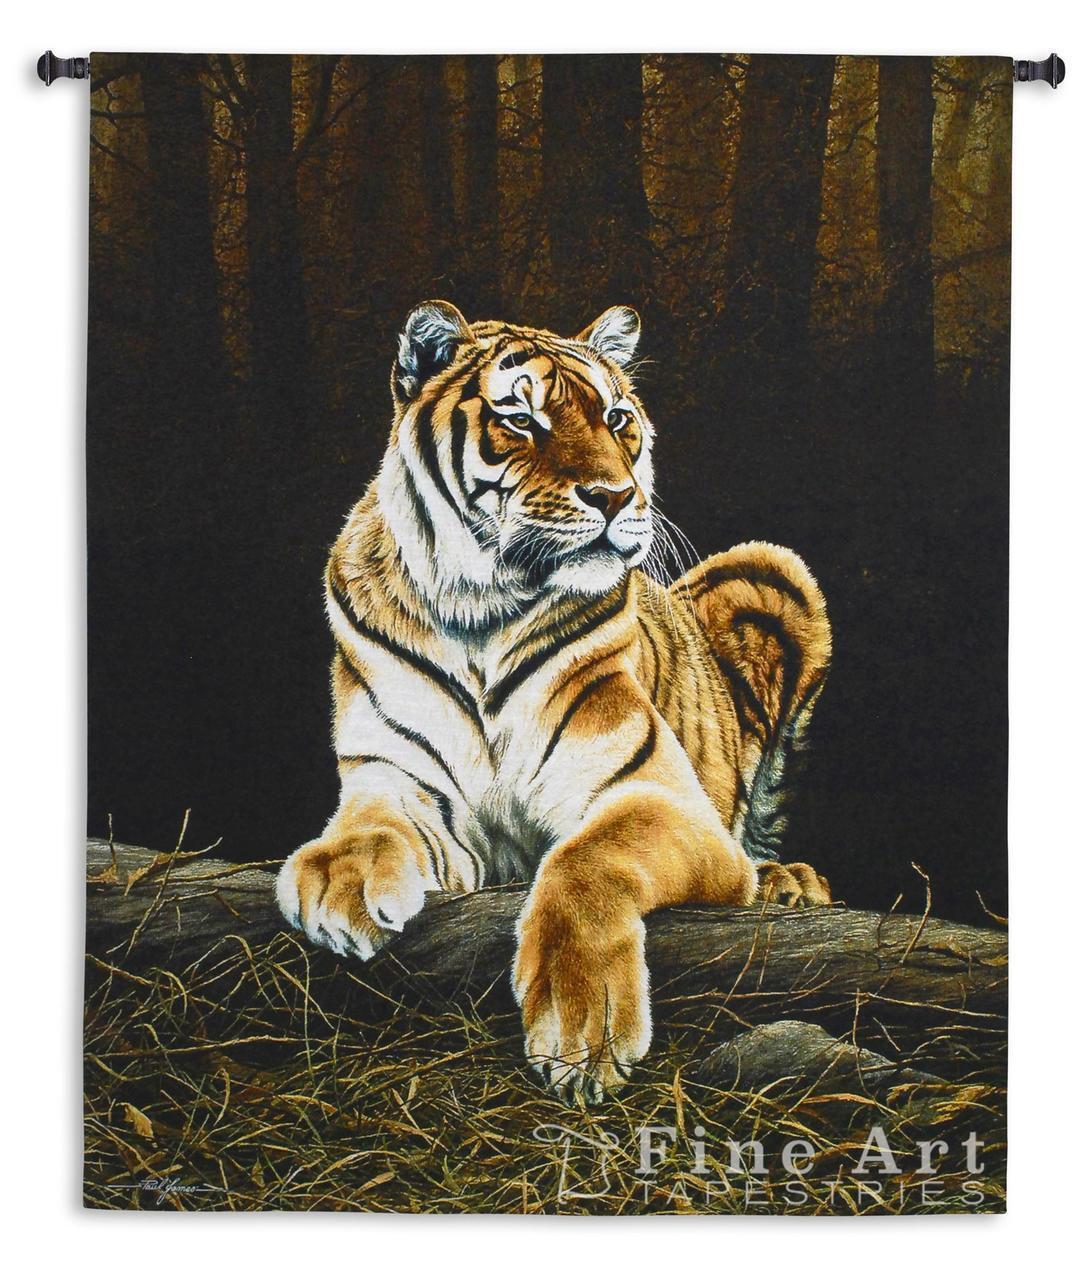 66x52 TIGER GRANDEUR Jungle Cat Wildlife Tapestry Wall Hanging